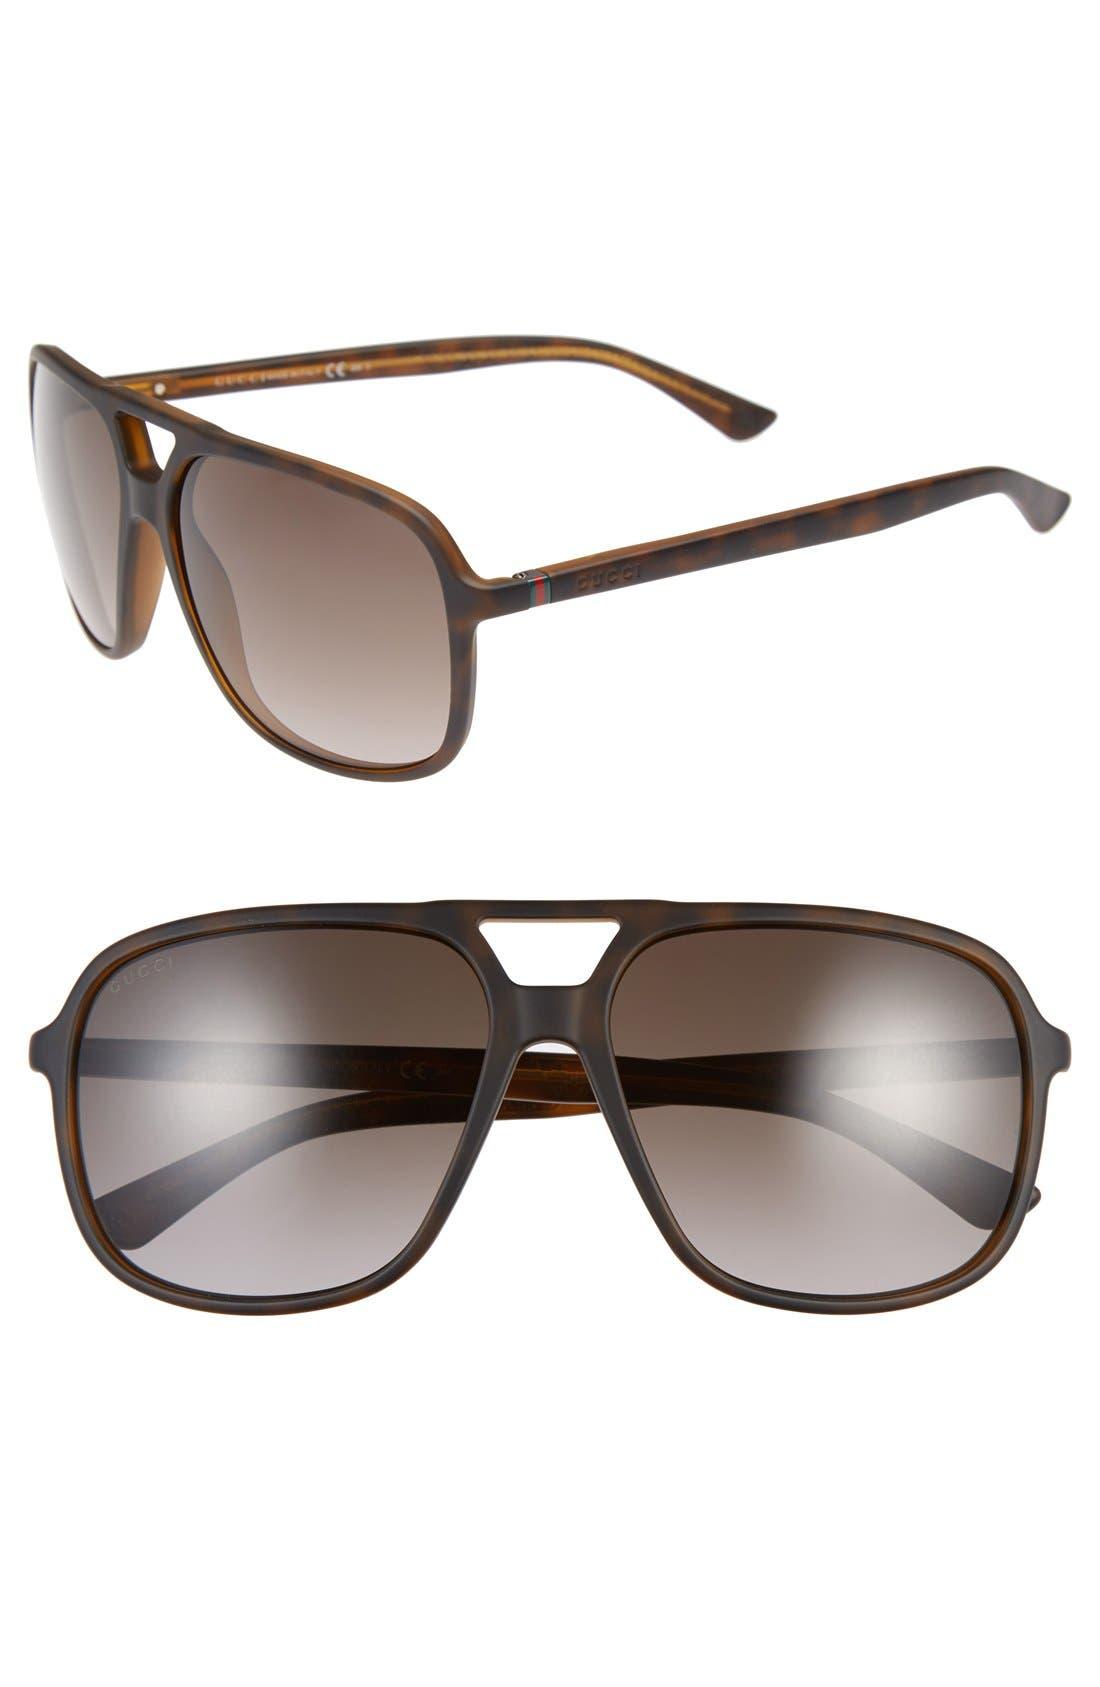 Alternate Image 1 Selected - Gucci 60mm Aviator Sunglasses